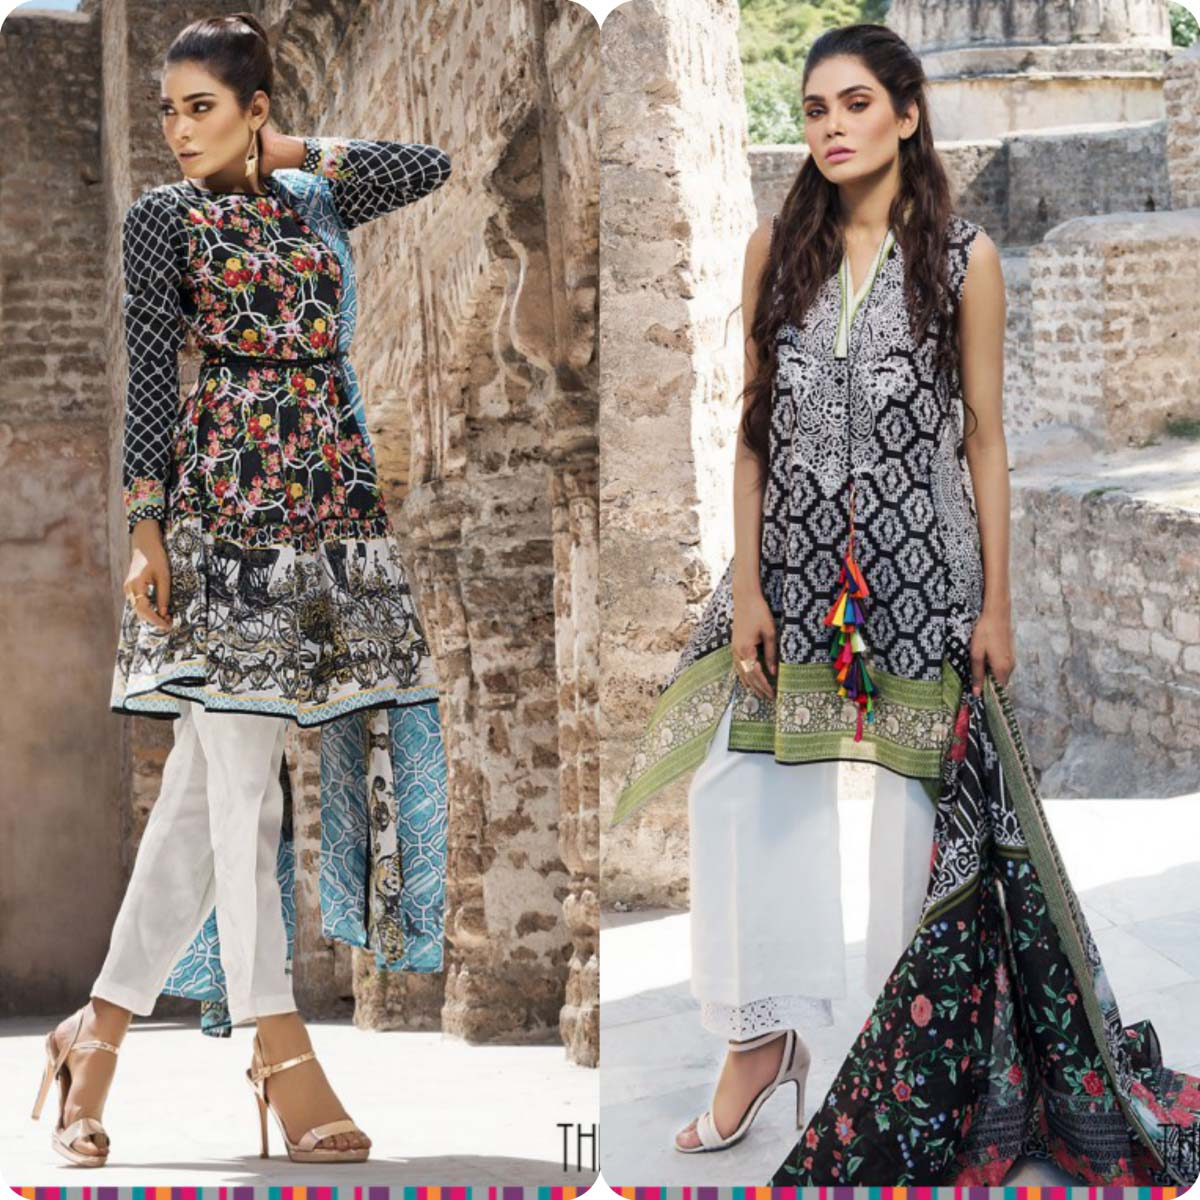 Stylish Embroidered Eid KurtisTunics for Girls By THREDZ 2016-2016 Complete Look-Book (13)